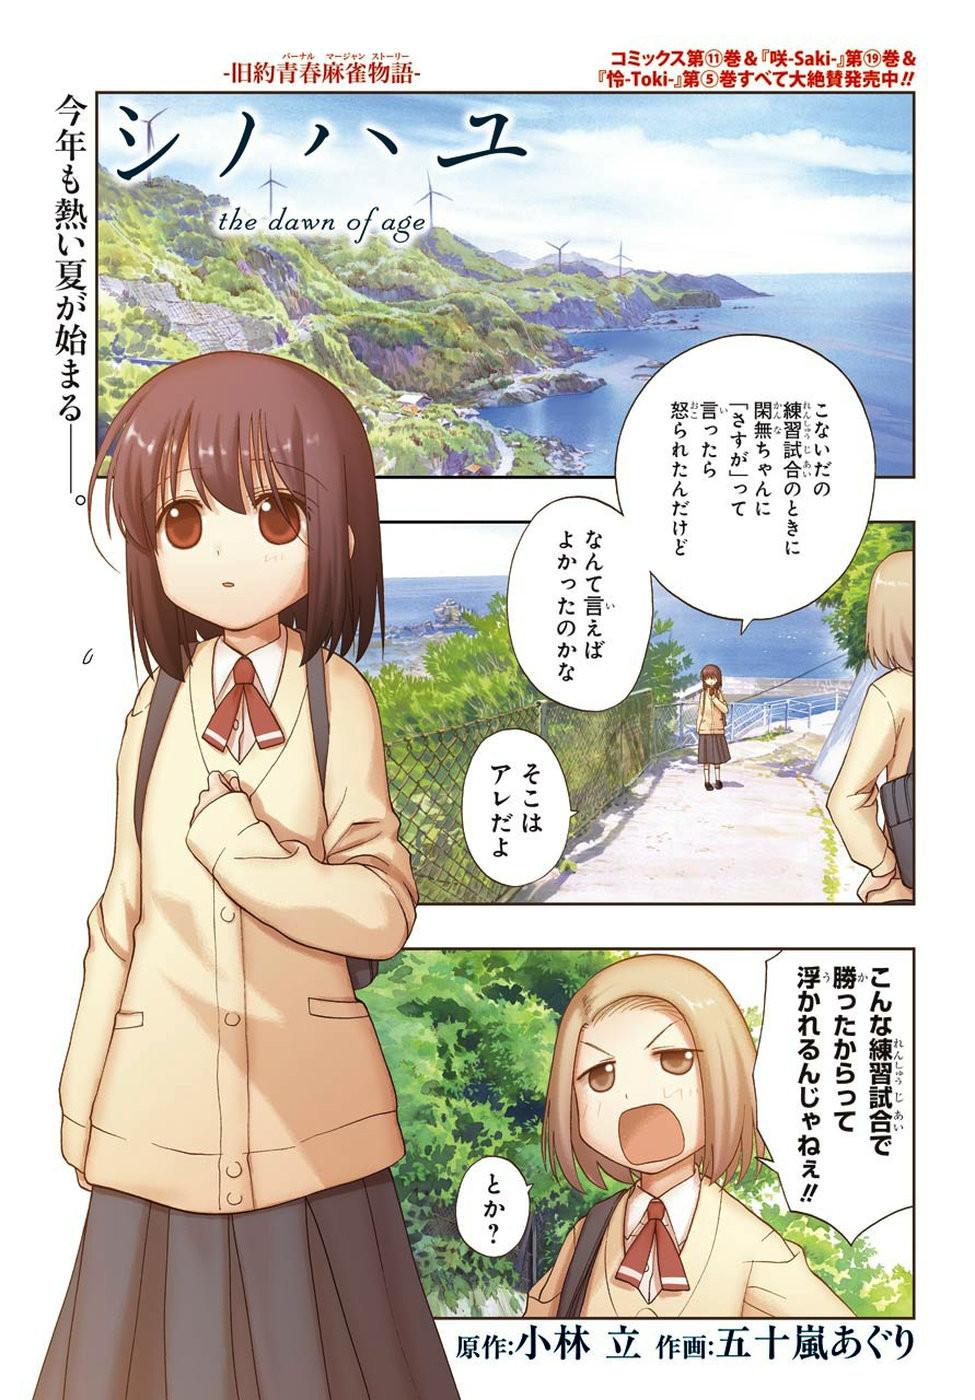 Shinohayu - The Dawn of Age Manga - Chapter 073 - Page 1